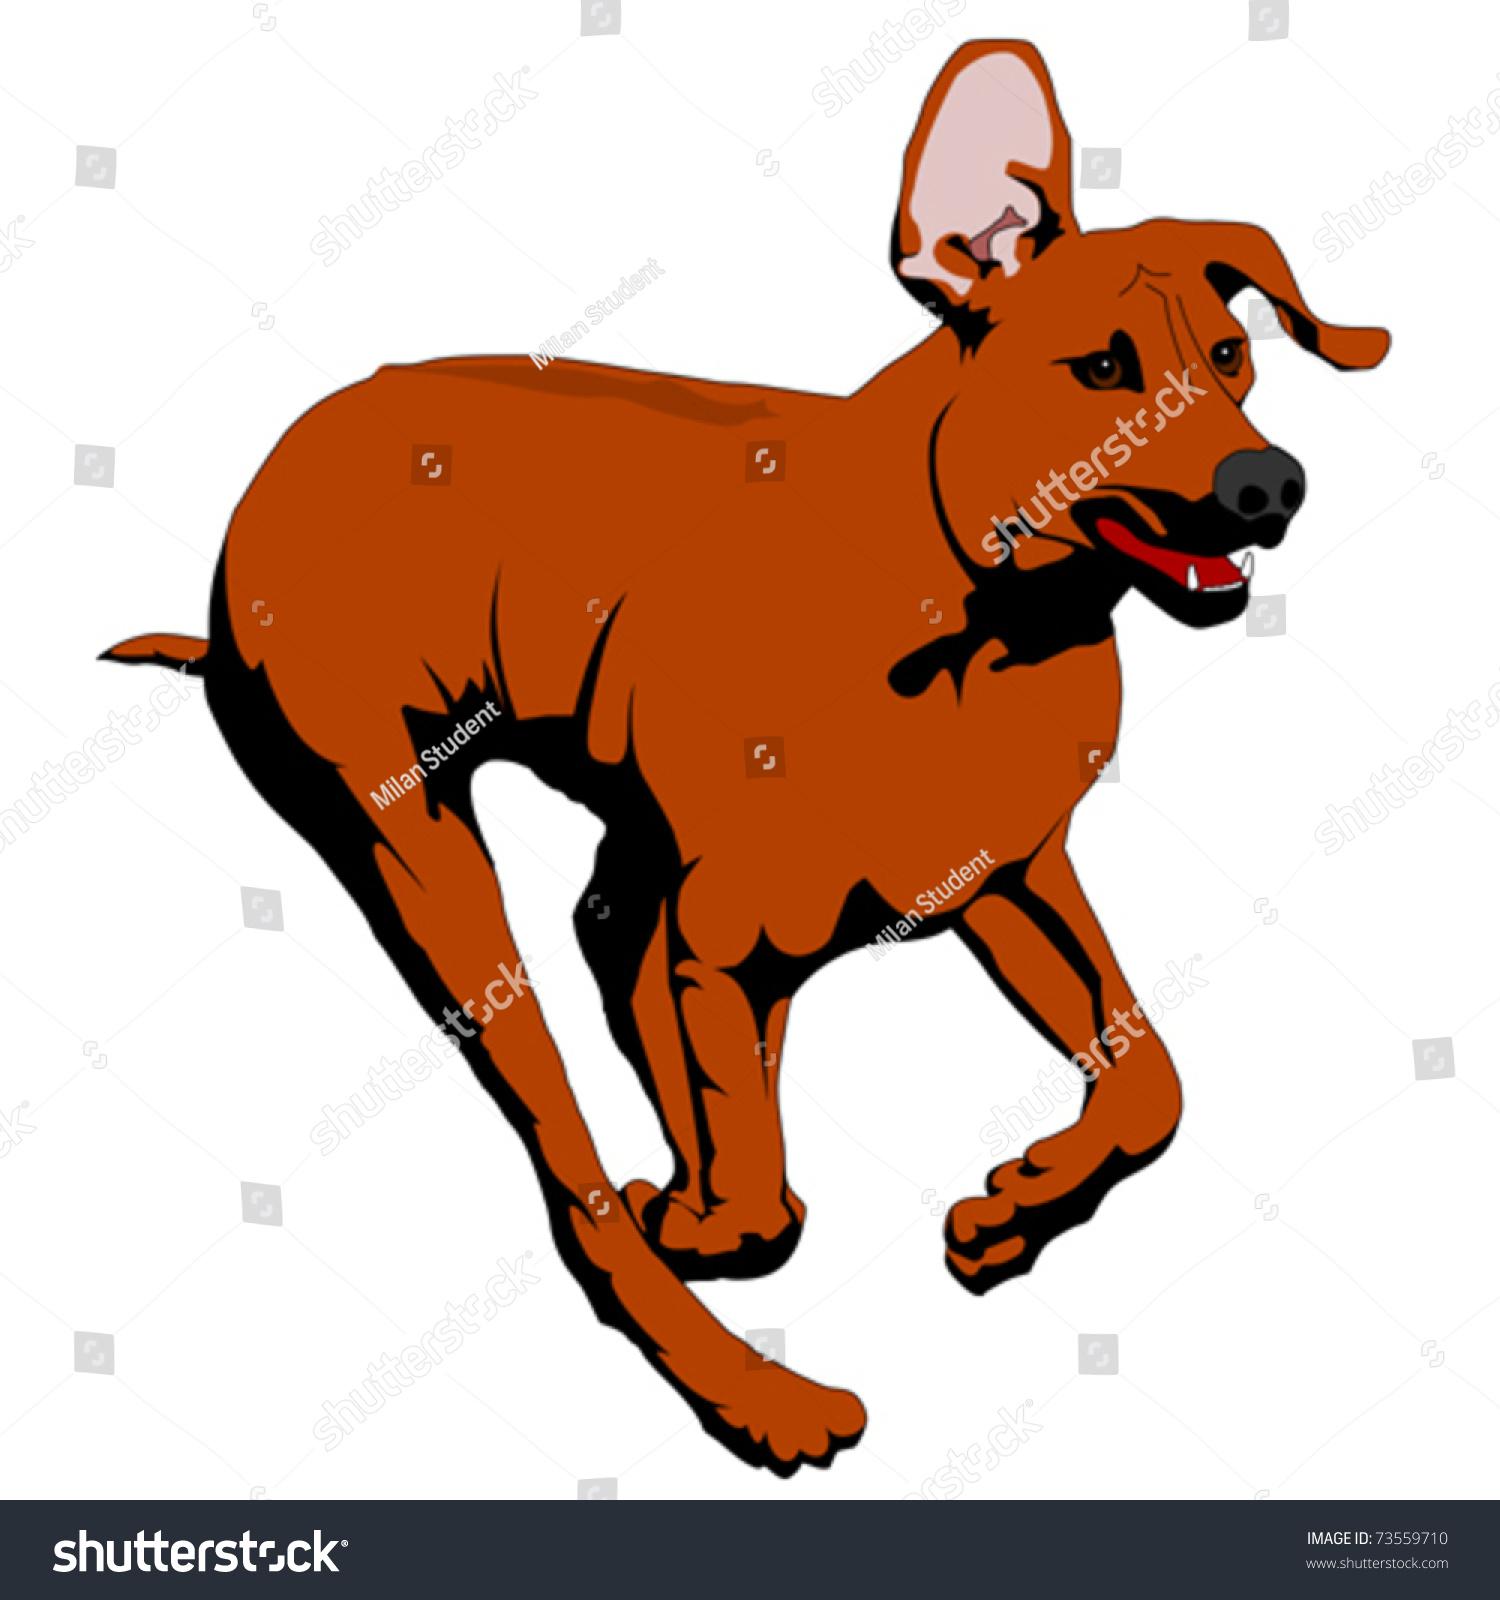 Cartoon dog stock photos images amp pictures shutterstock - Rhodesian Ridgeback Running Vector